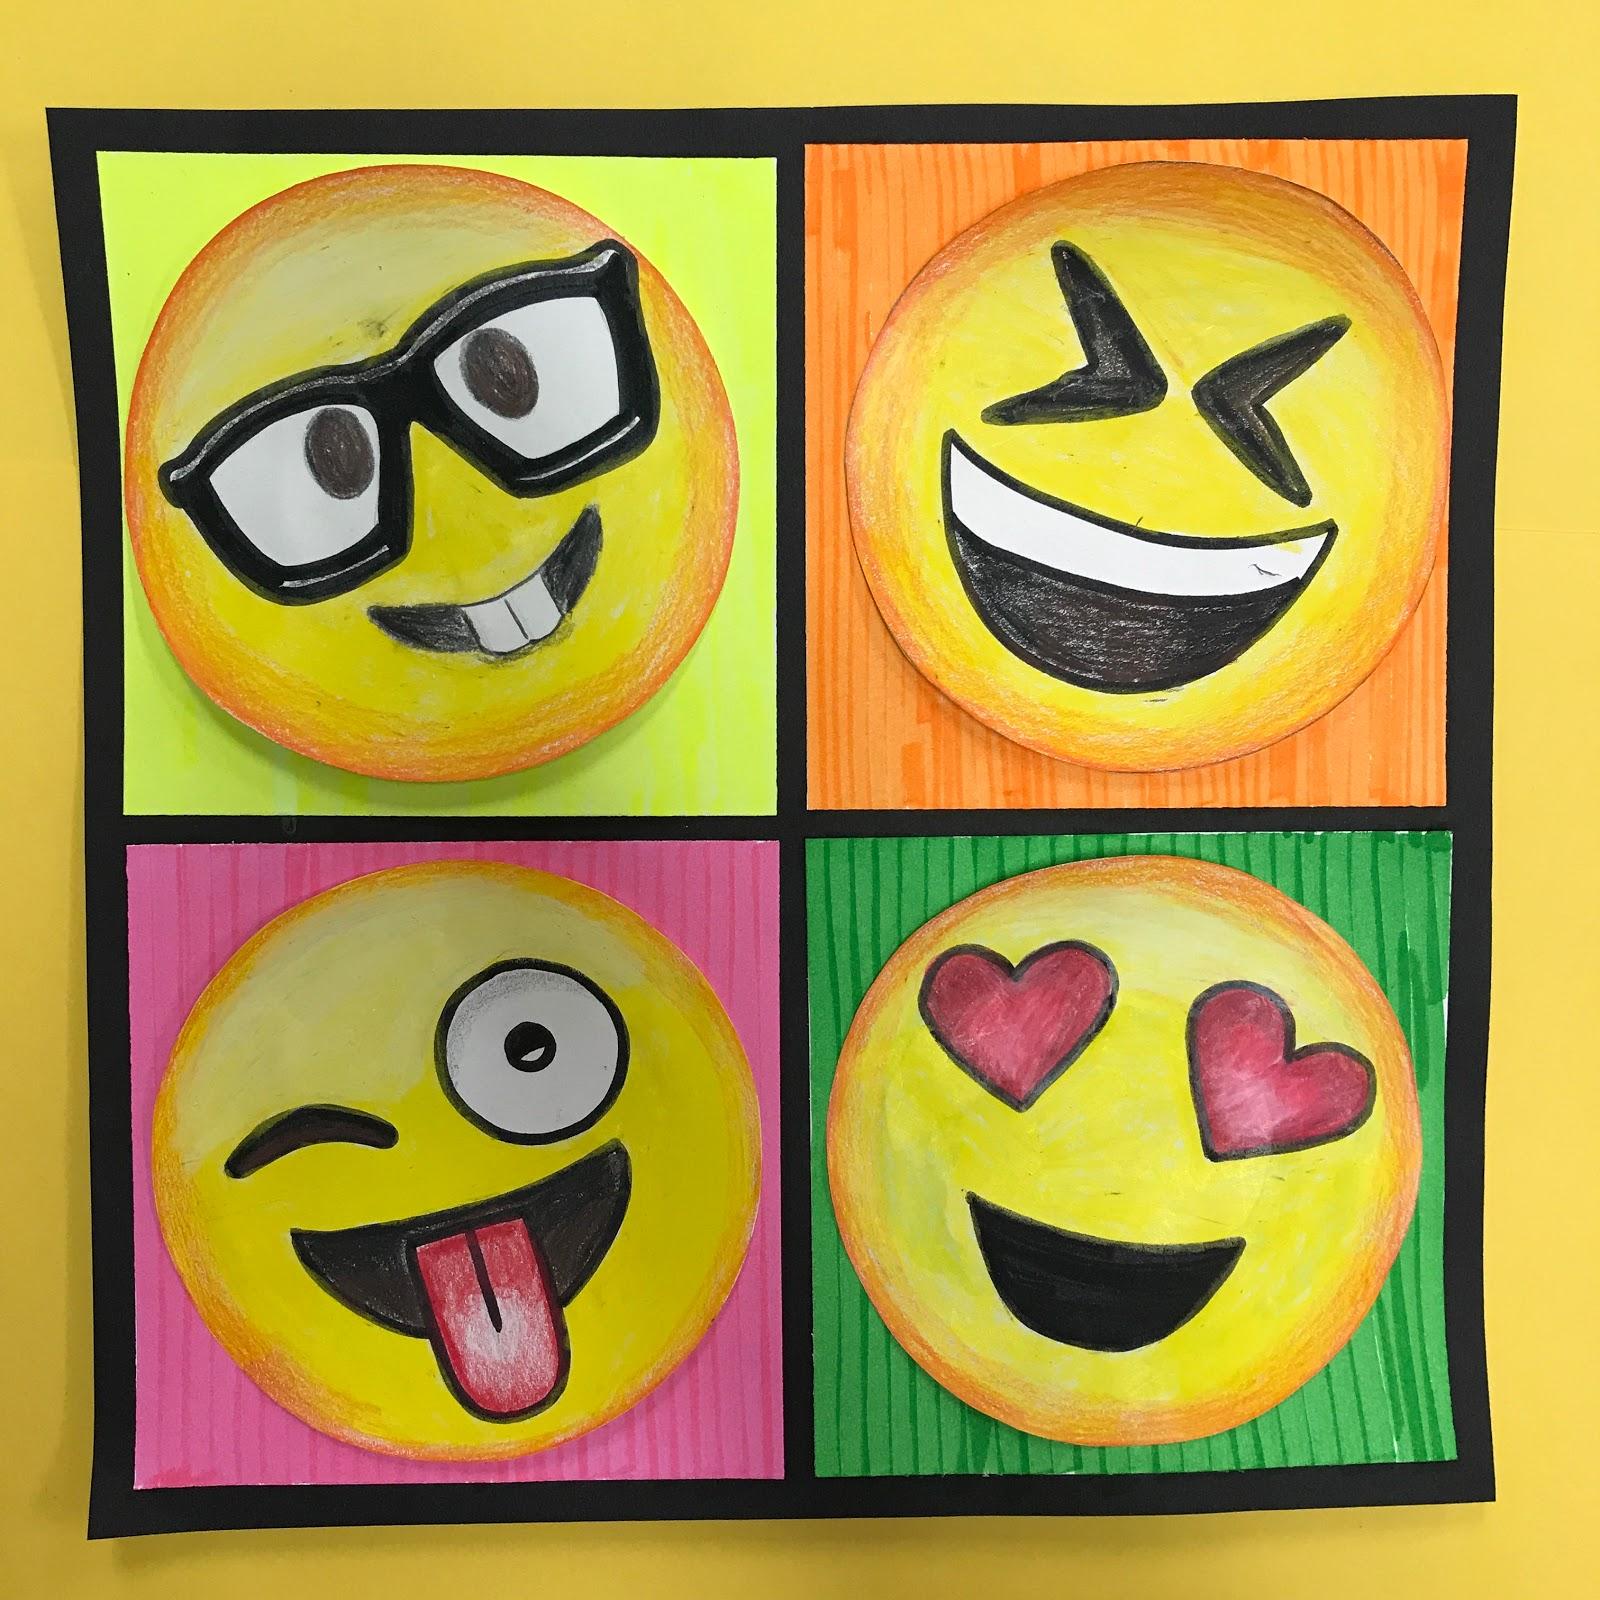 Elements Of The Art Room 4th Grade Pop Art Emojis